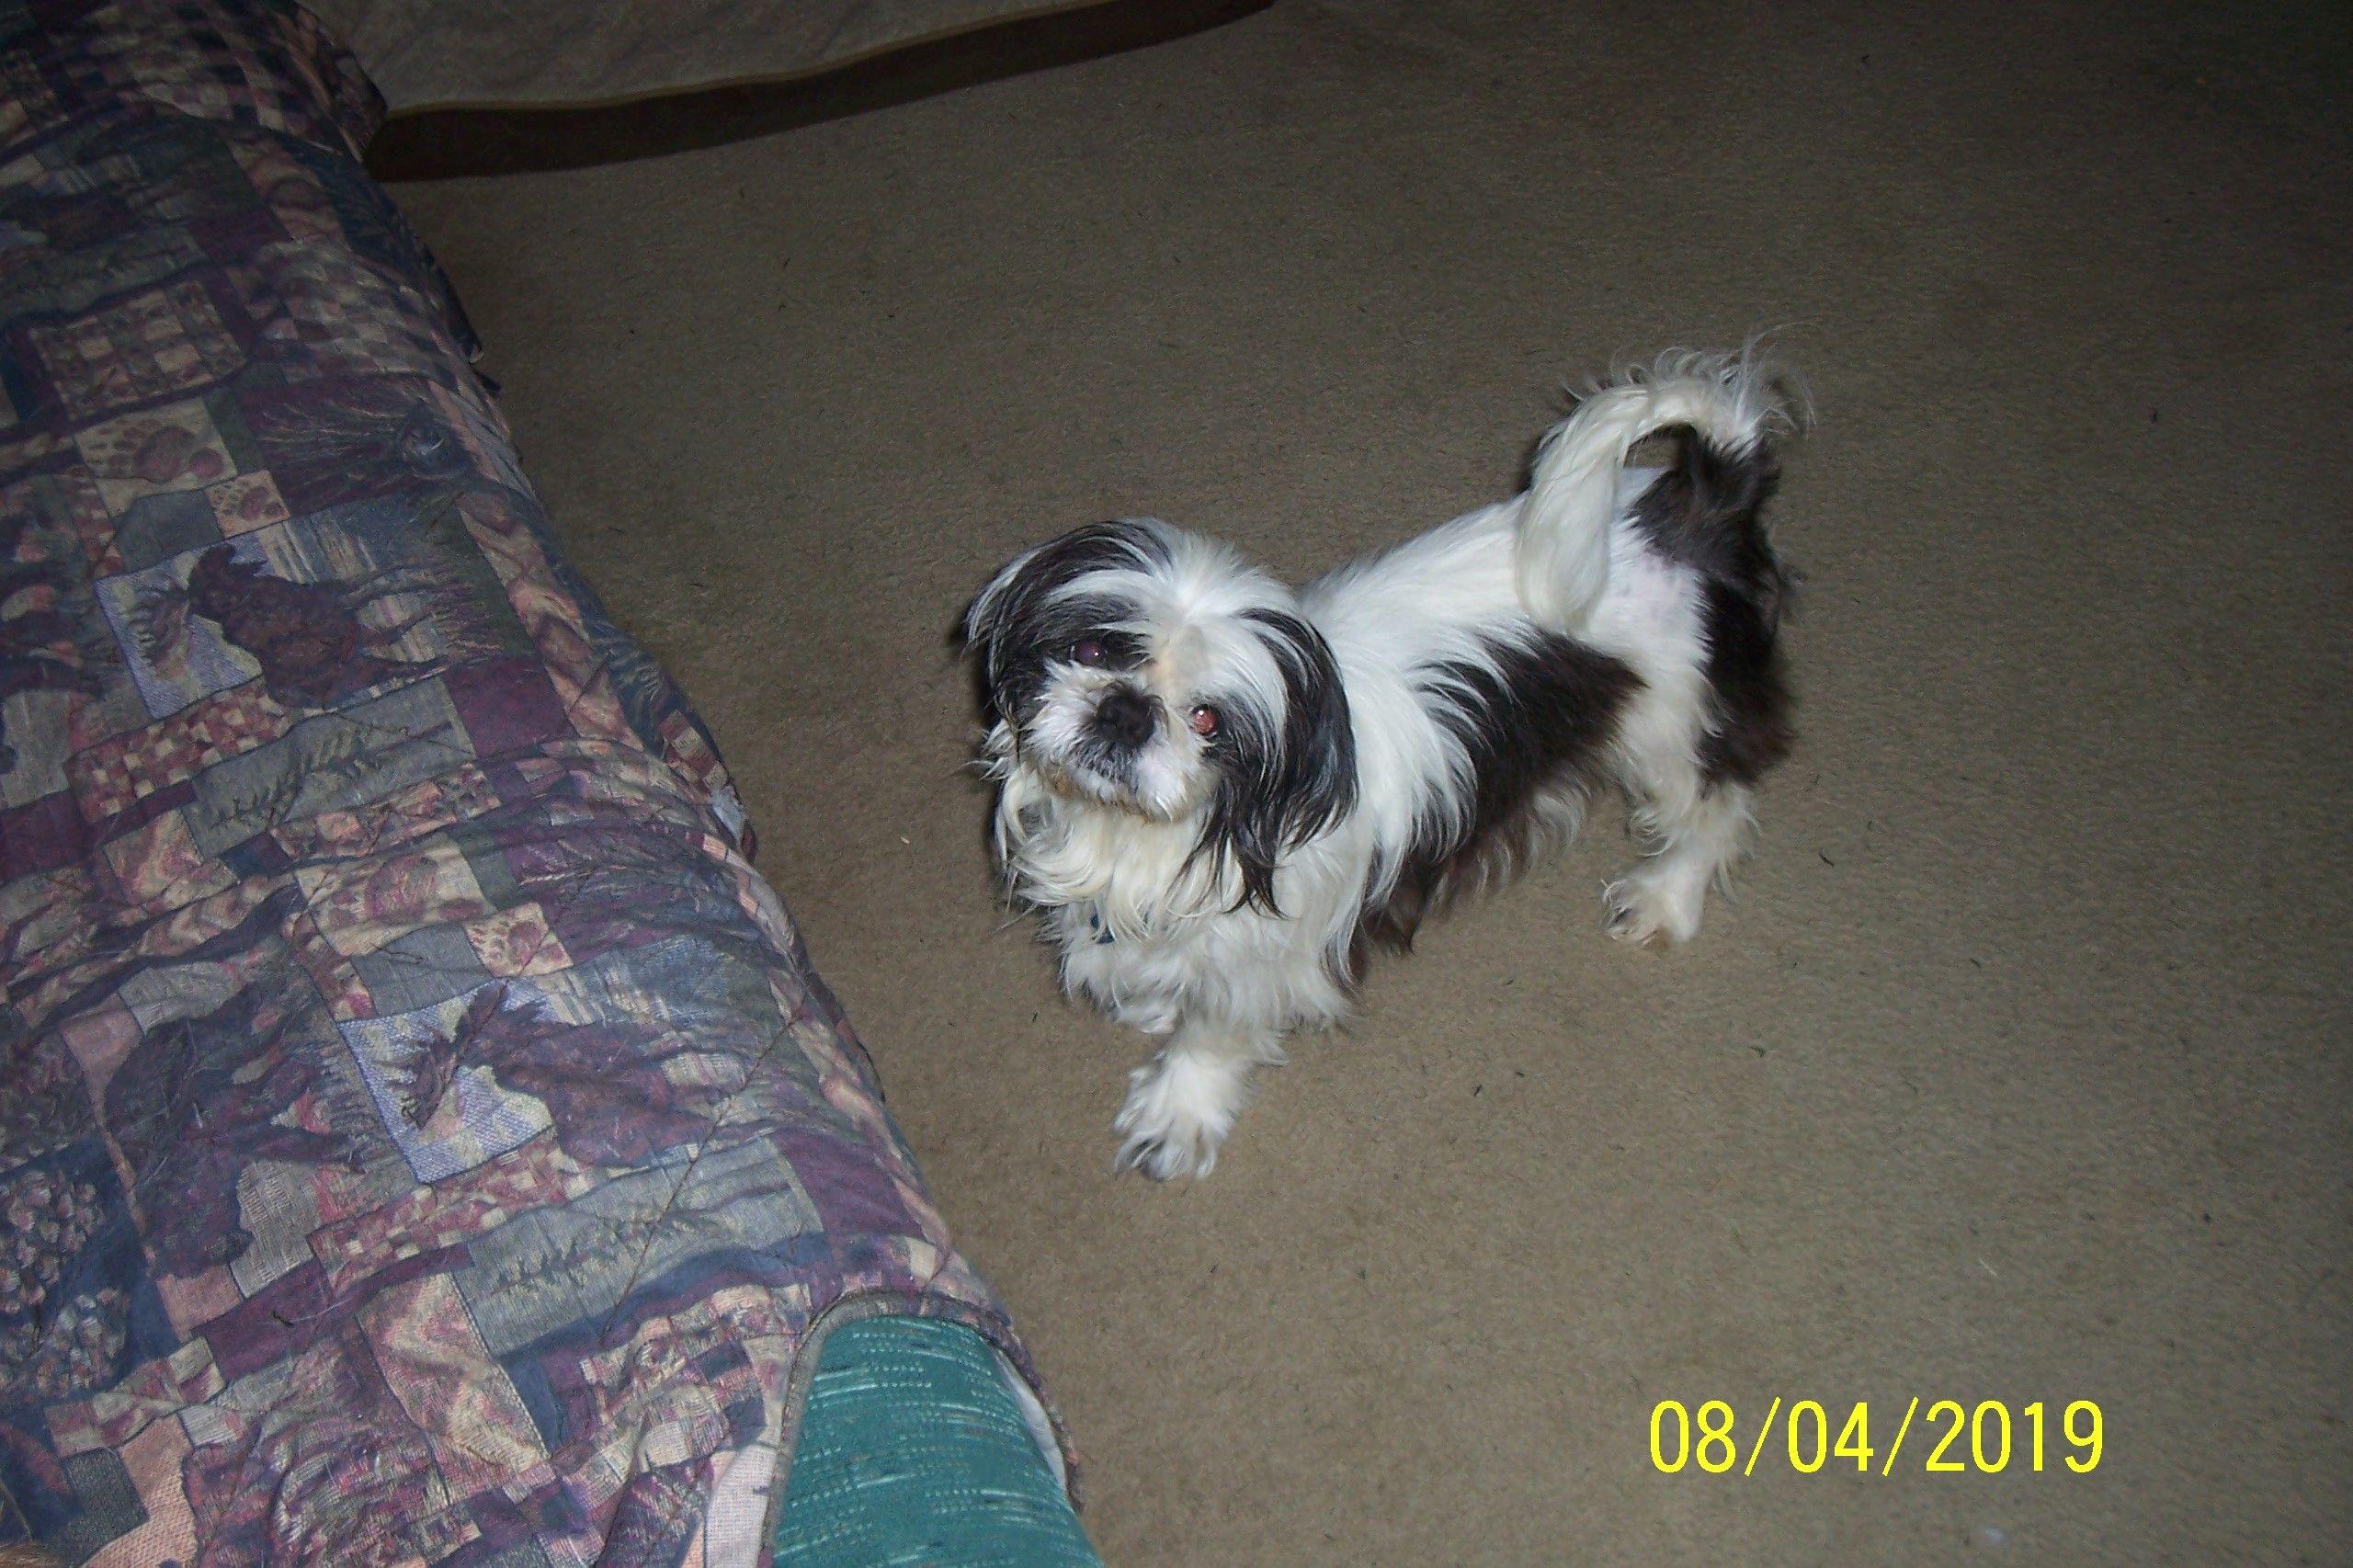 Dogs For Adoption Petfinder Dog Adoption Pet Adoption Dogs